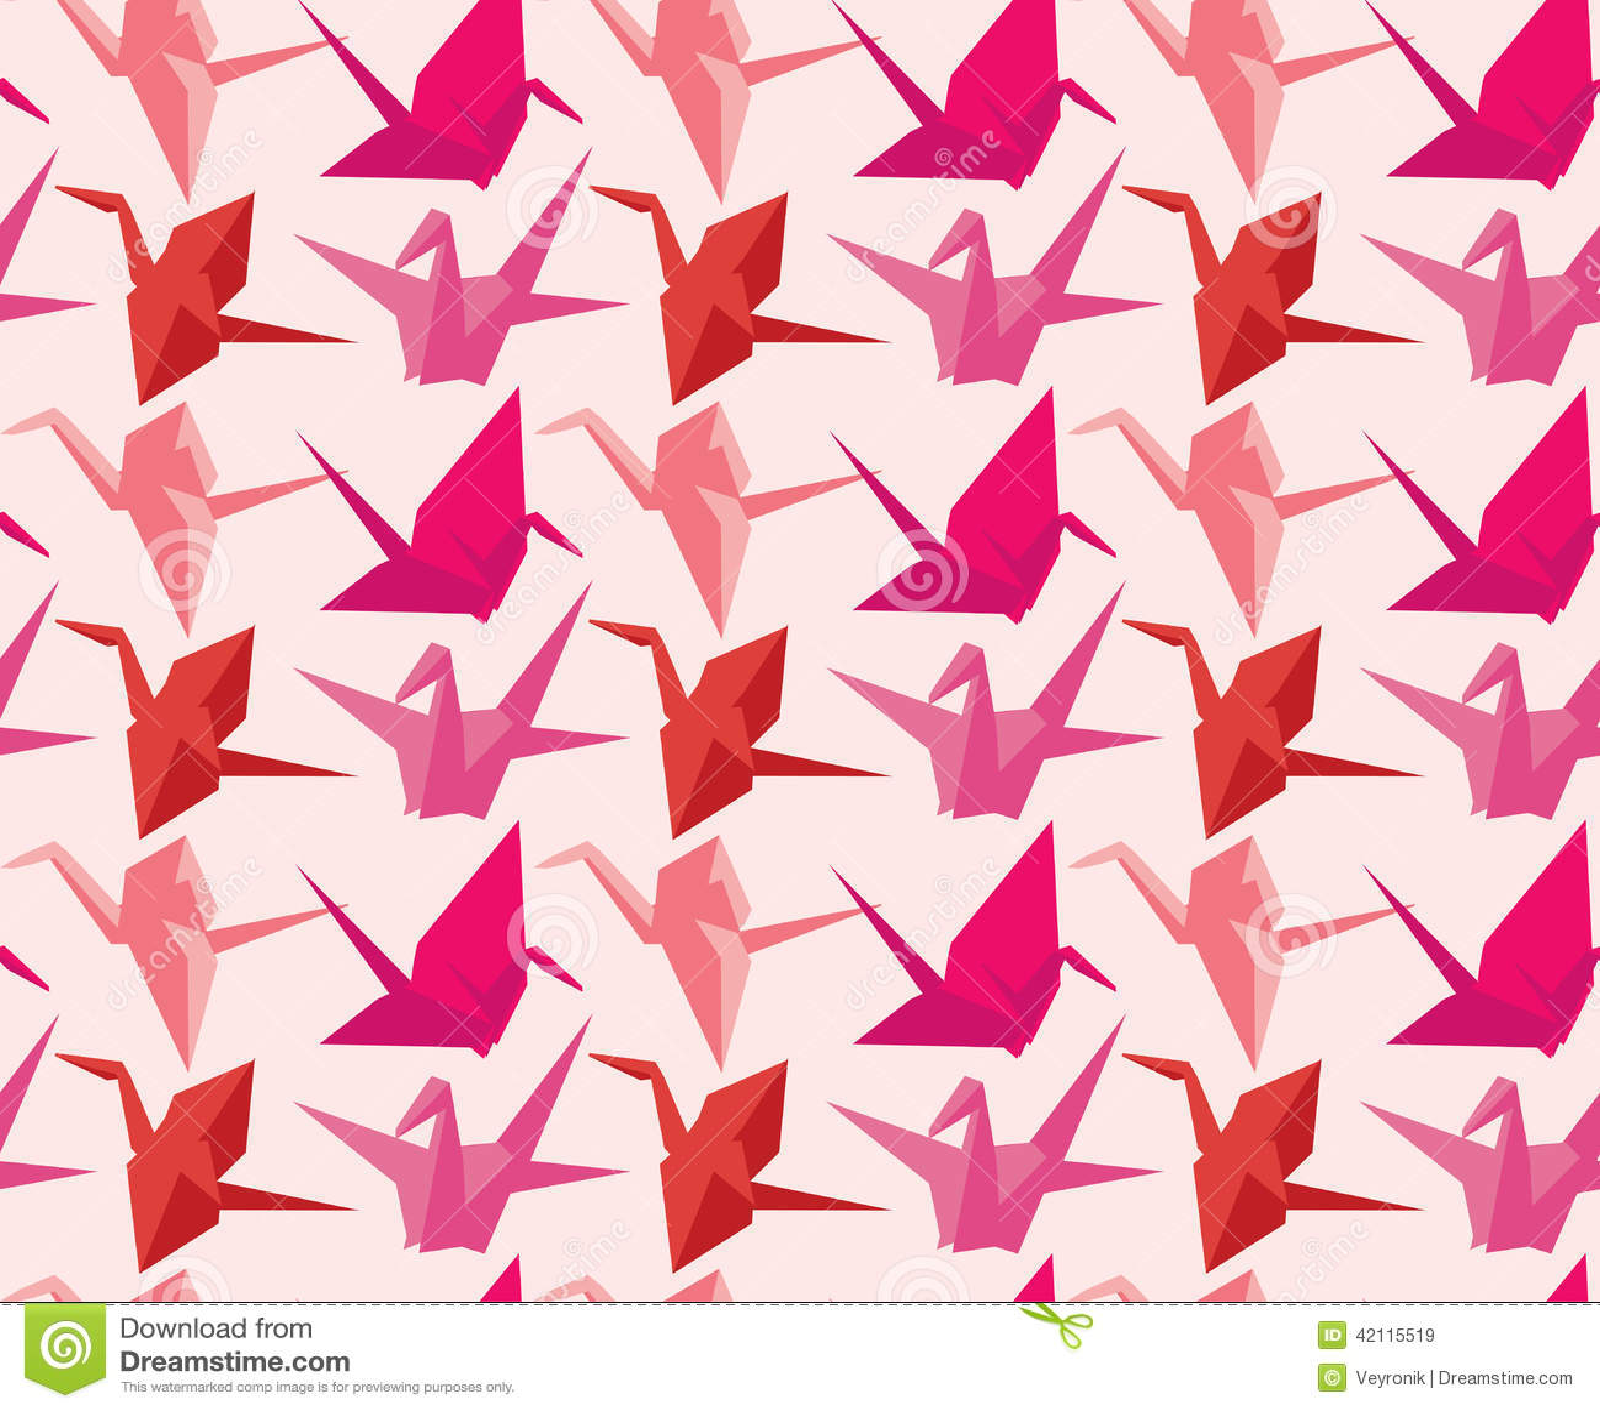 Animal Print Pink Wallpaper Japanese Paper Crane Pattern Stock Vector Image 42115519